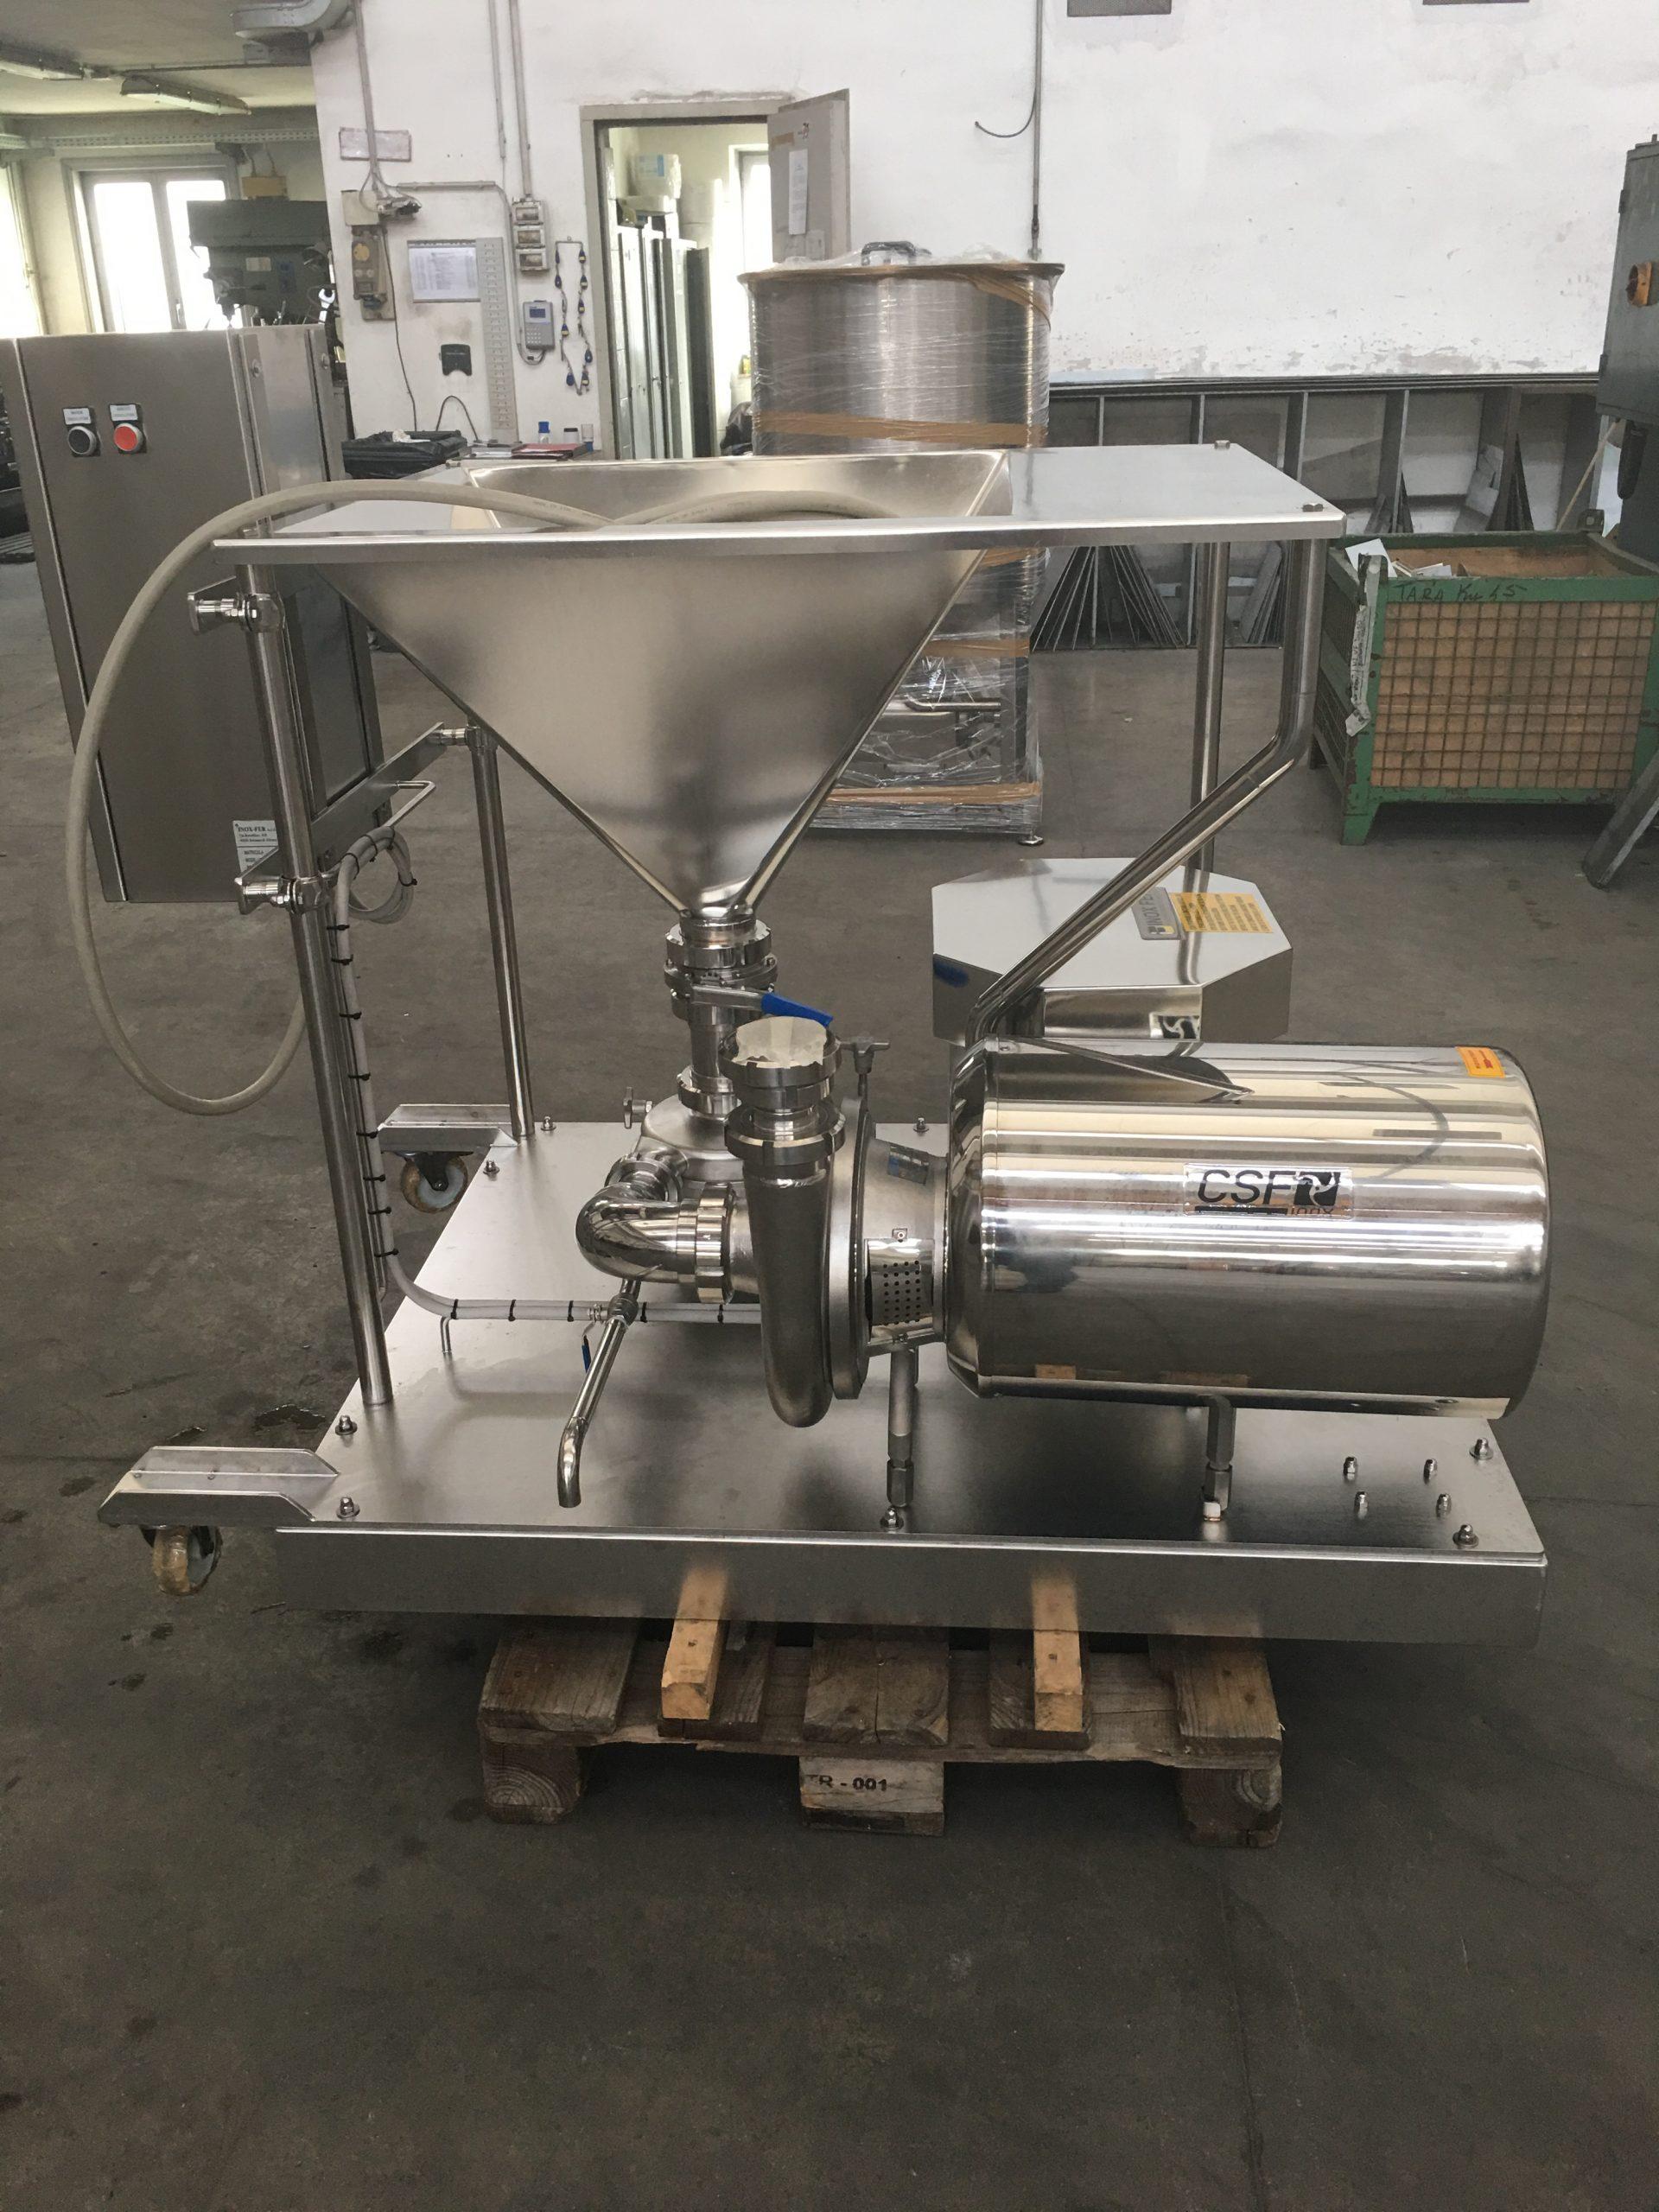 powder mixer for liquid dish detergent